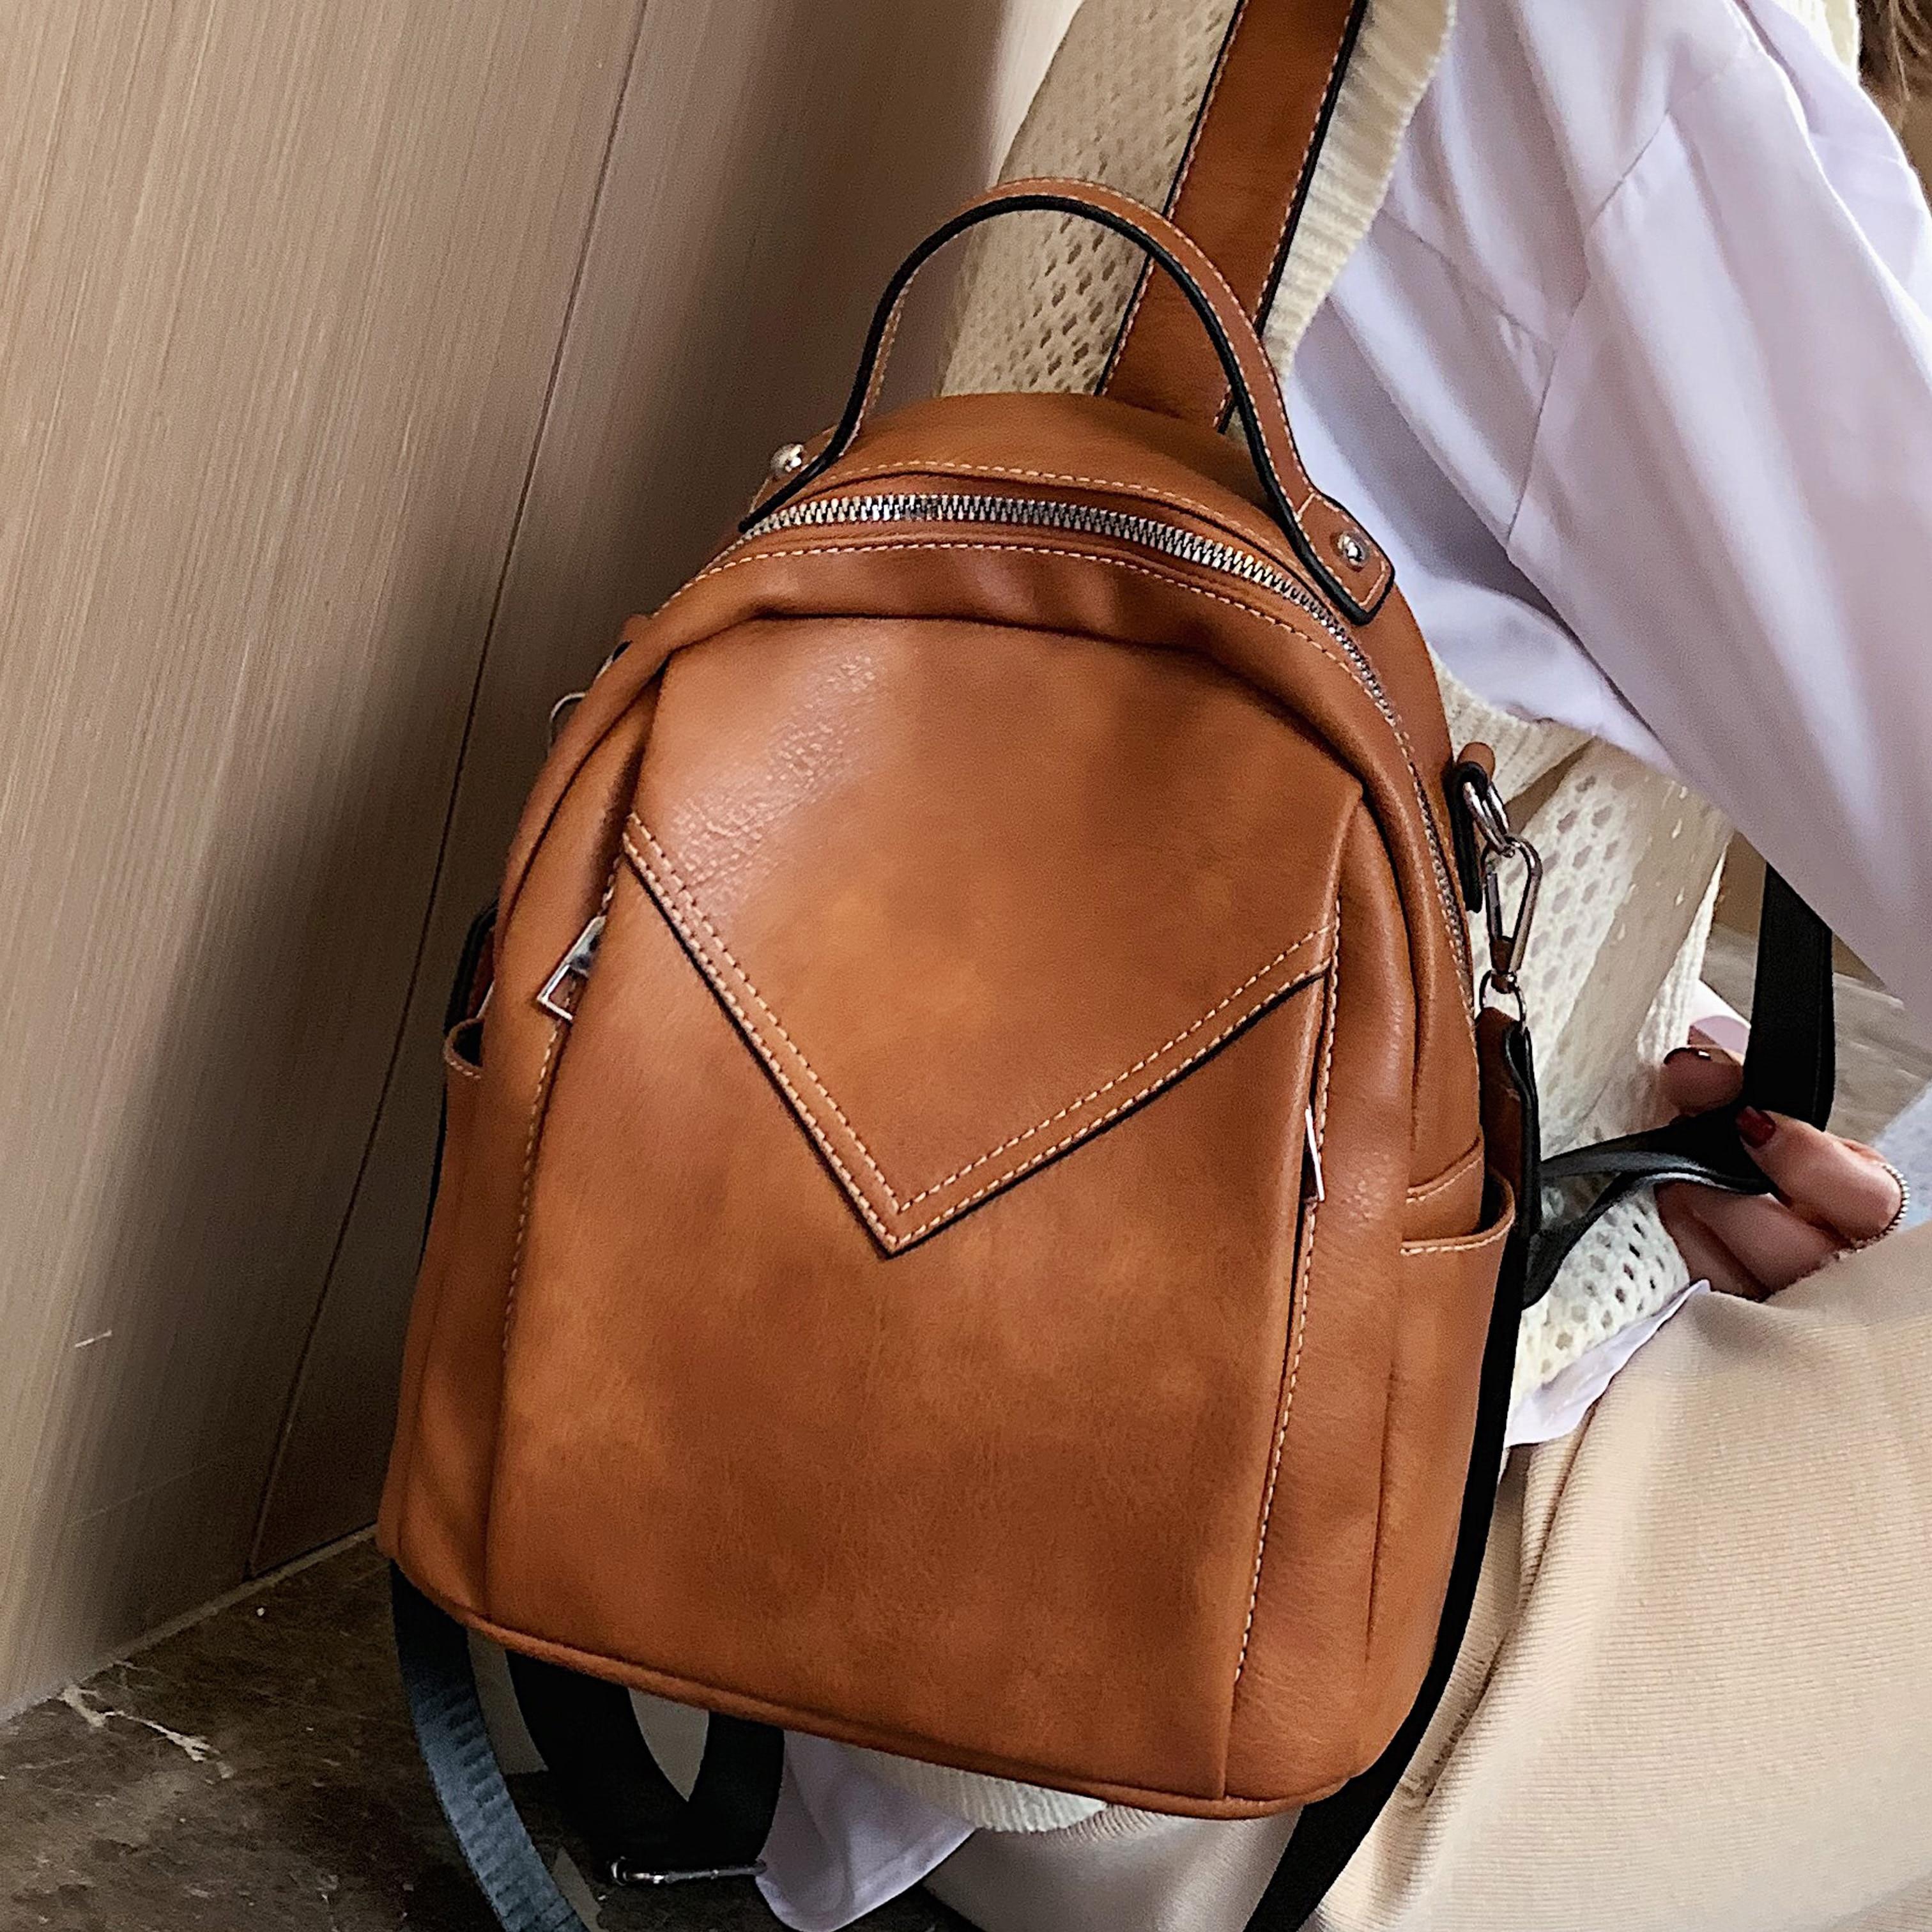 Women Cross Body Bag Dave White Messenger Bag Backpack Rucksack Functional Travel Casual Purses